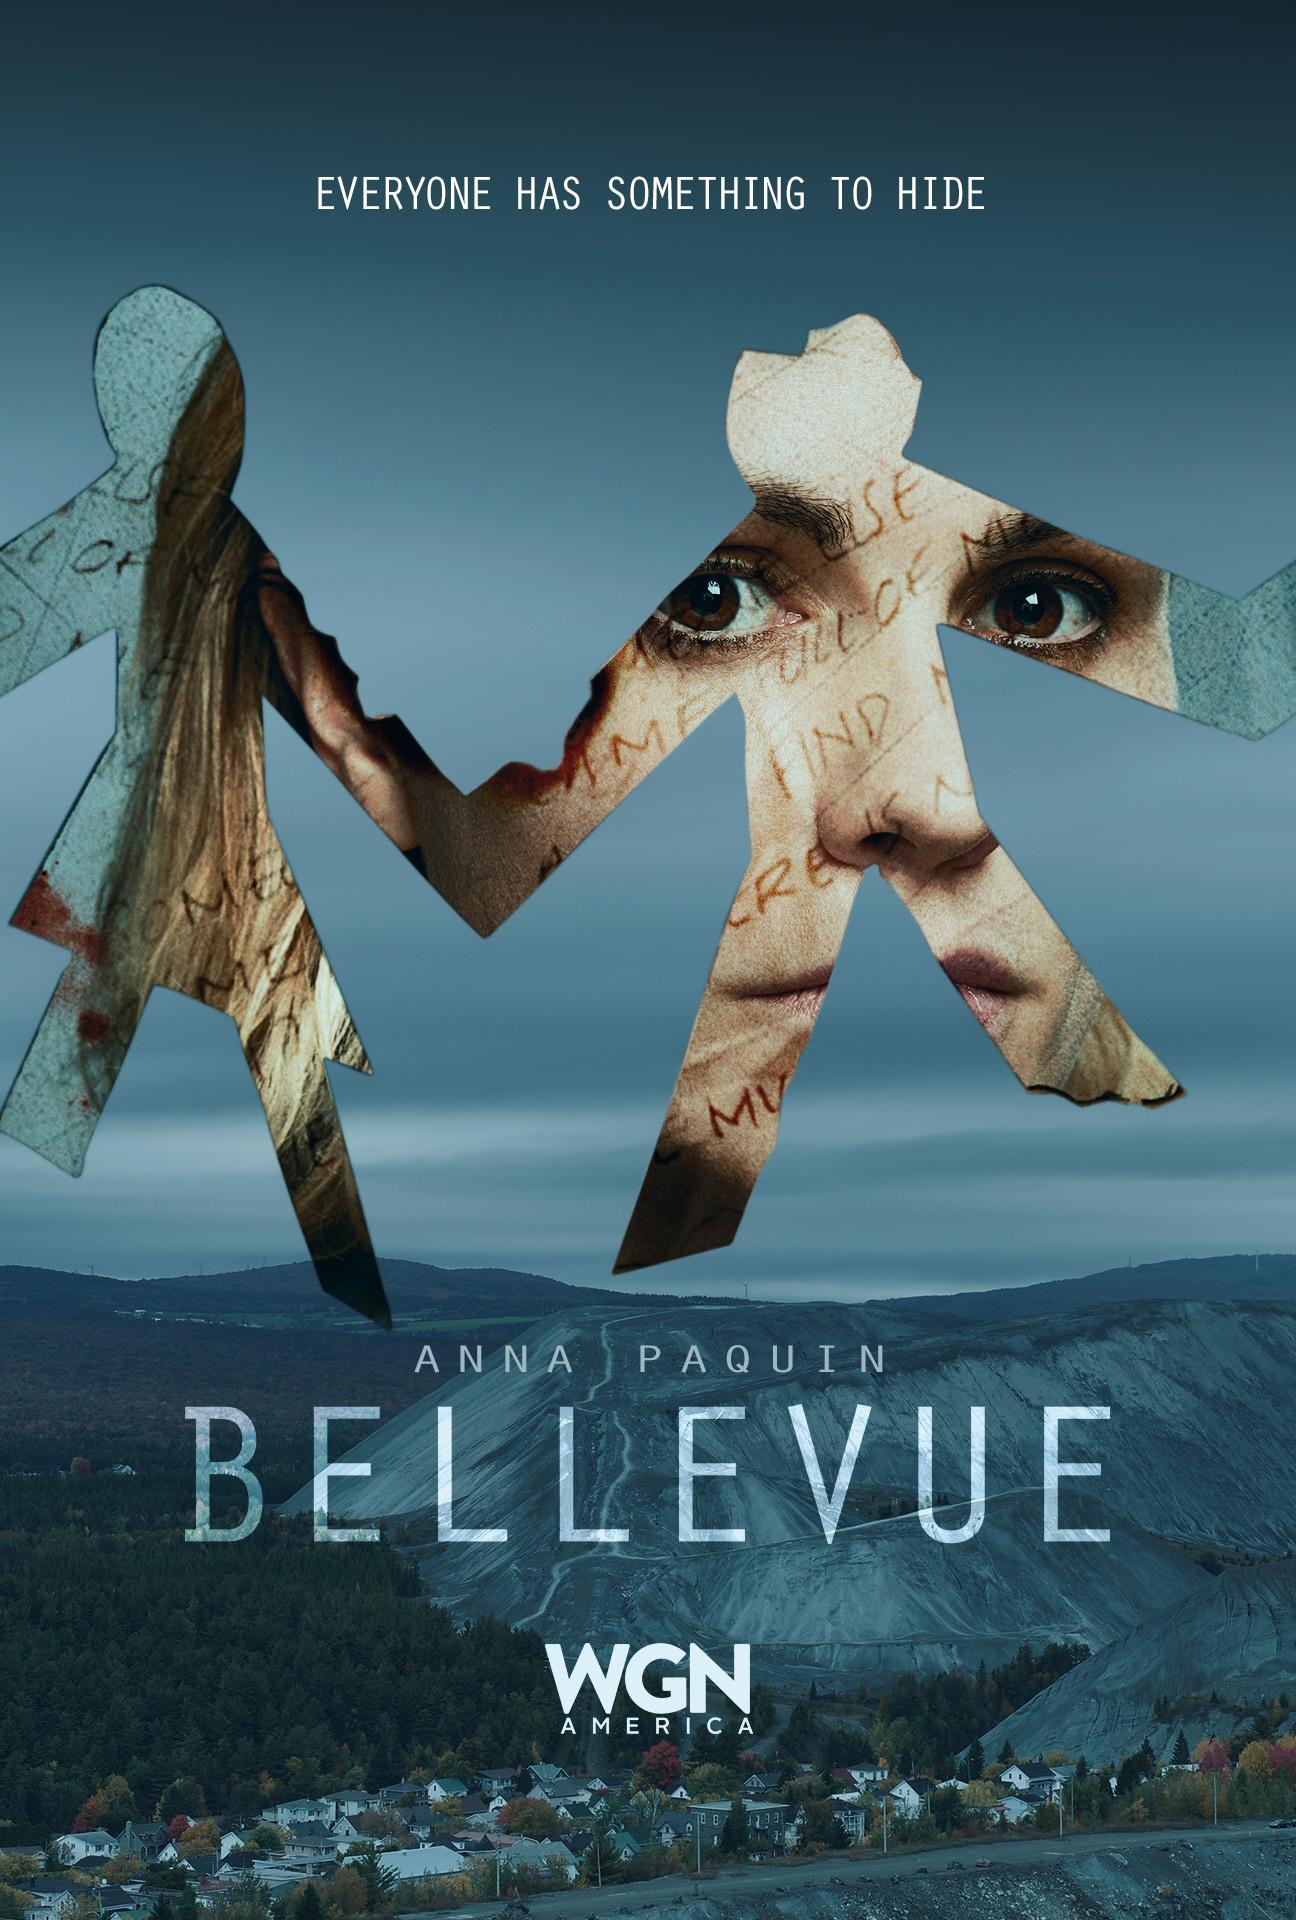 Bellevue Premiere, WGN America